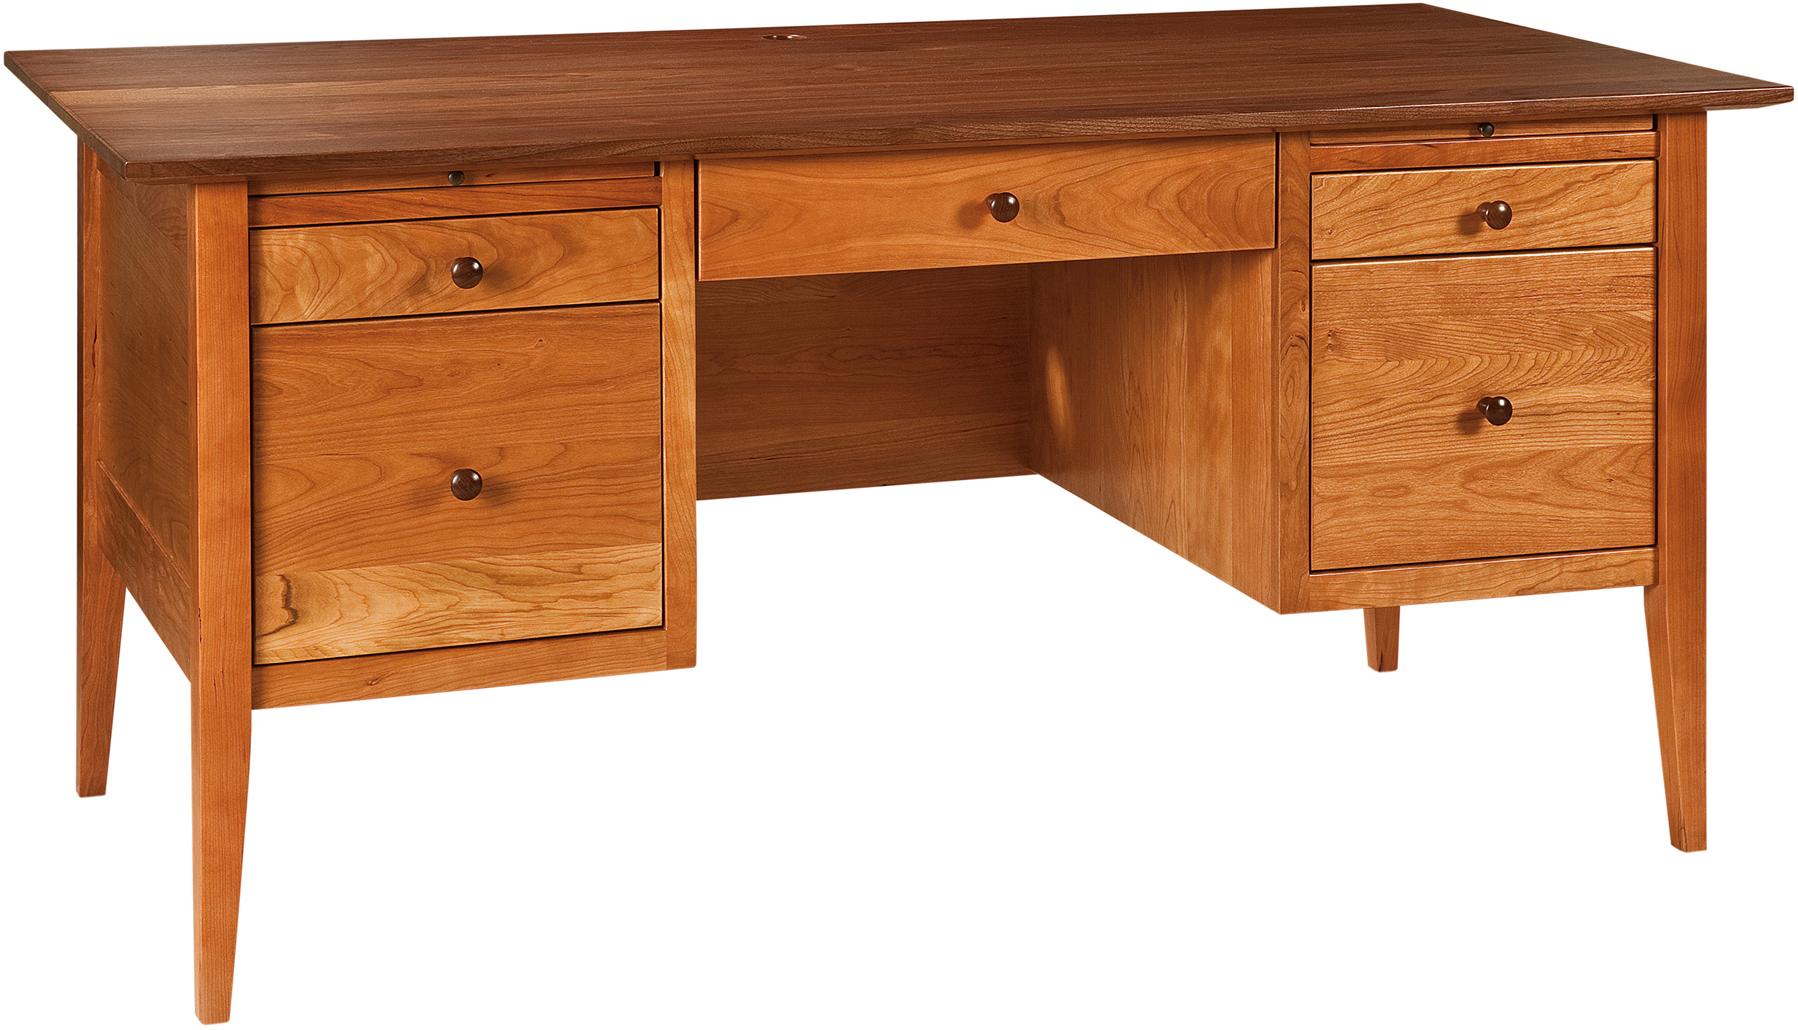 Custom Handcrafted Hardwood Alamo Amish Desk